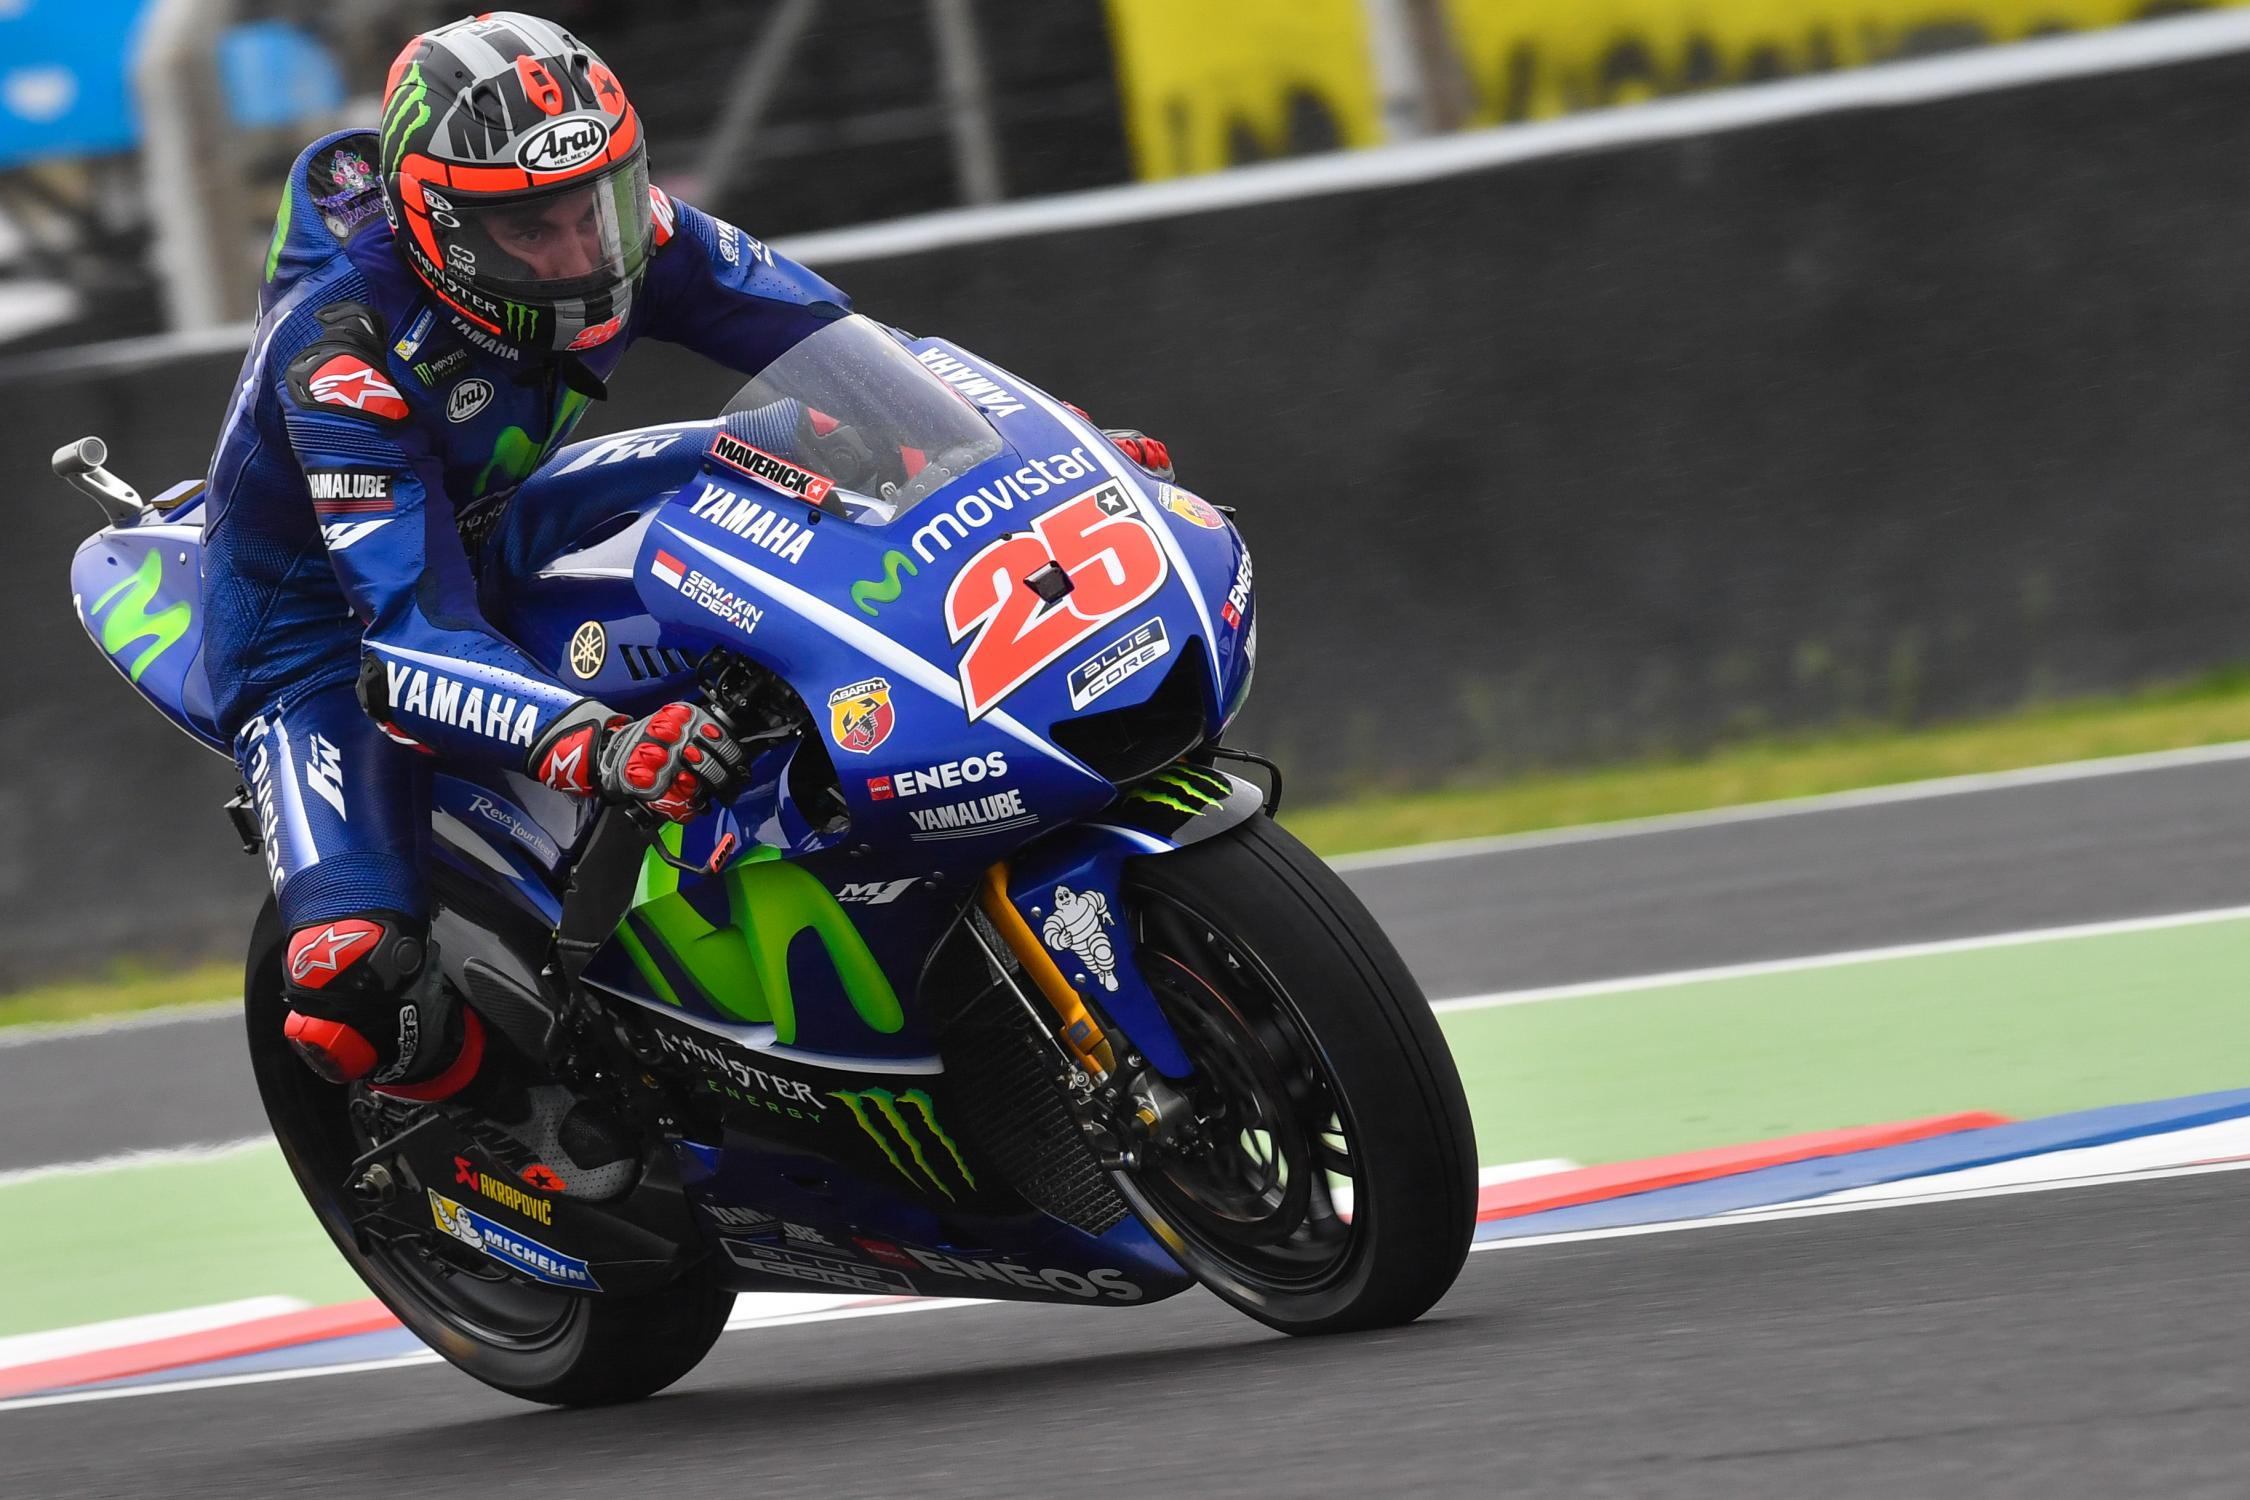 [MotoGP] Argentine 25-maverick-vinales-esplg5_6668.gallery_full_top_fullscreen